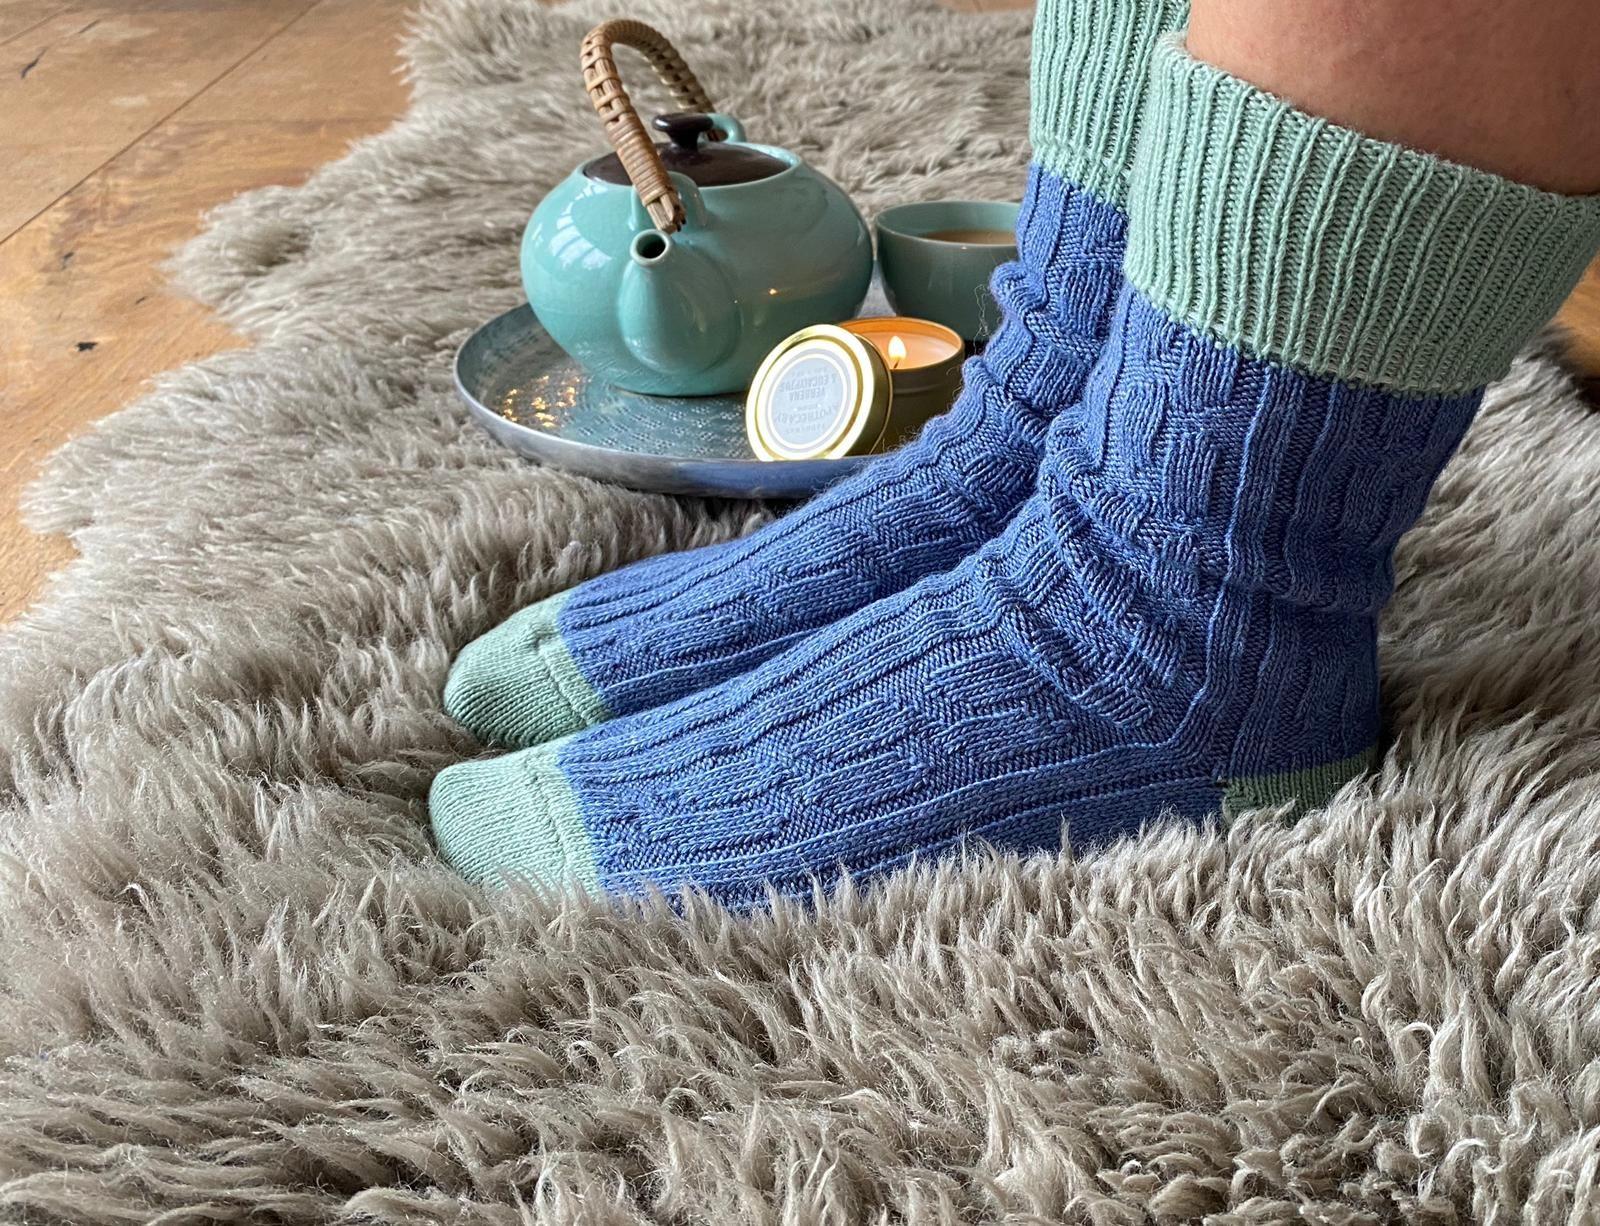 British Eco Gifts Wool Socks